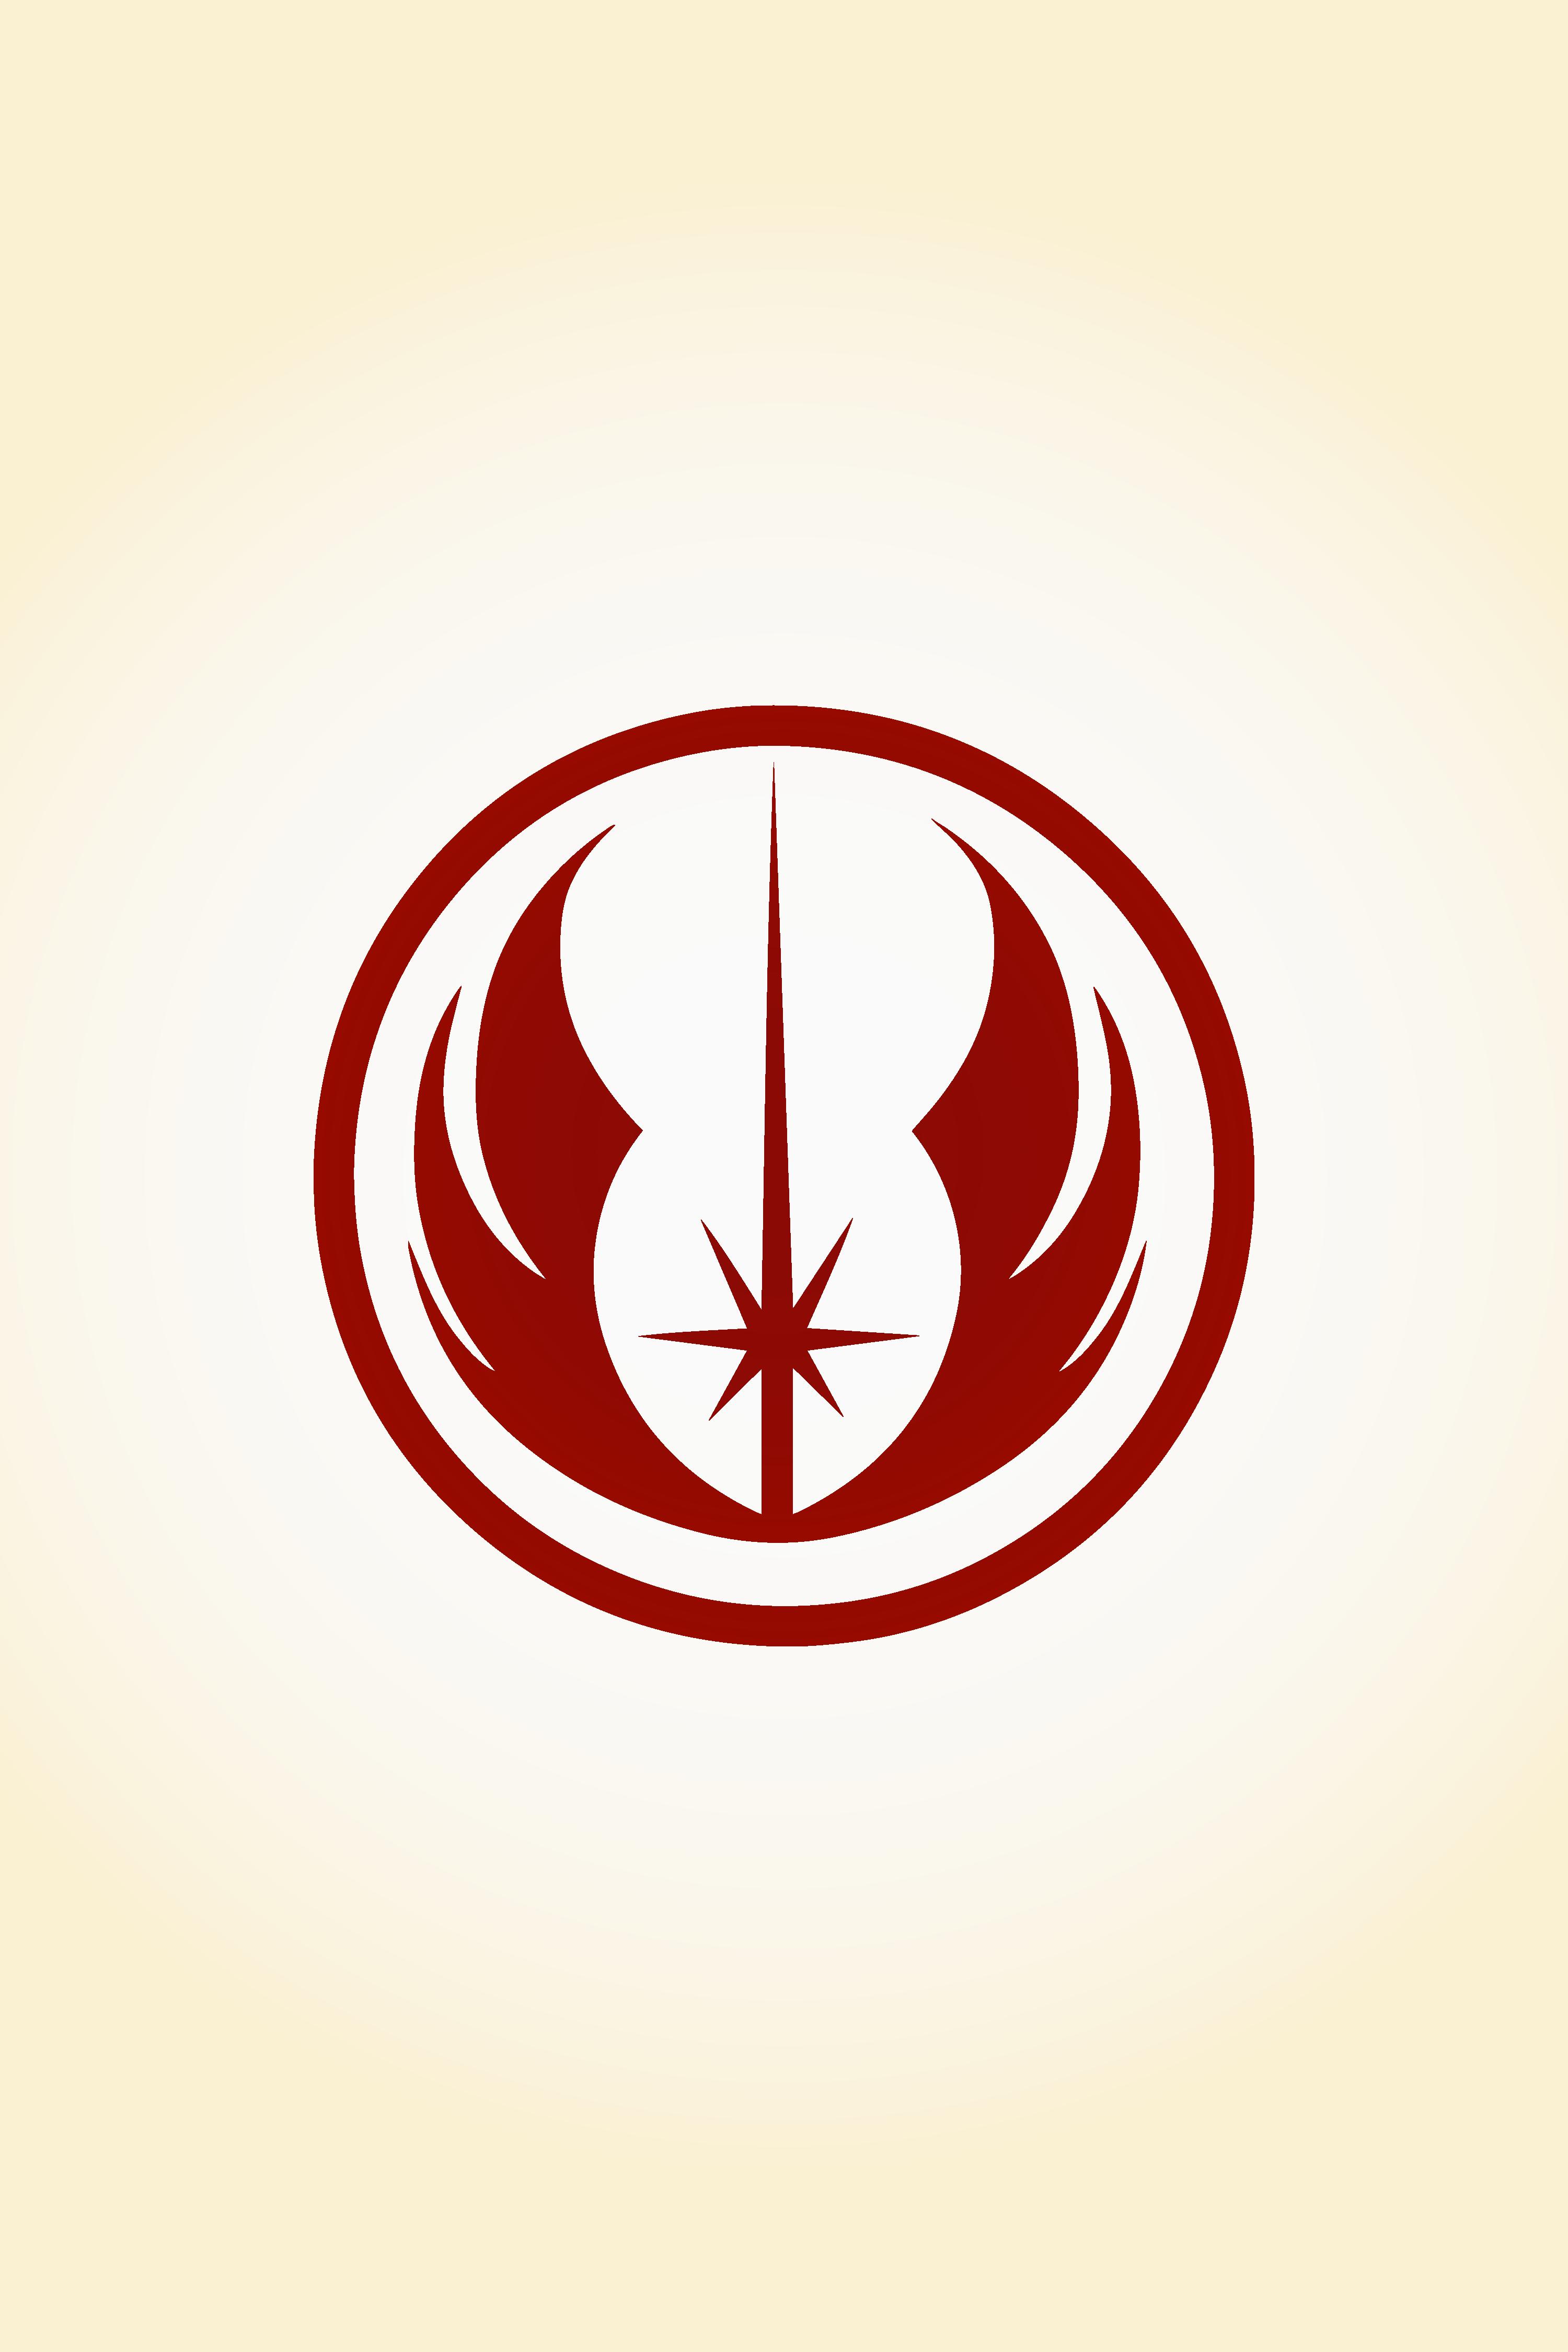 Logogami Shop Redbubble Star Wars Wallpaper Star Wars Tattoo Star Wars Universe